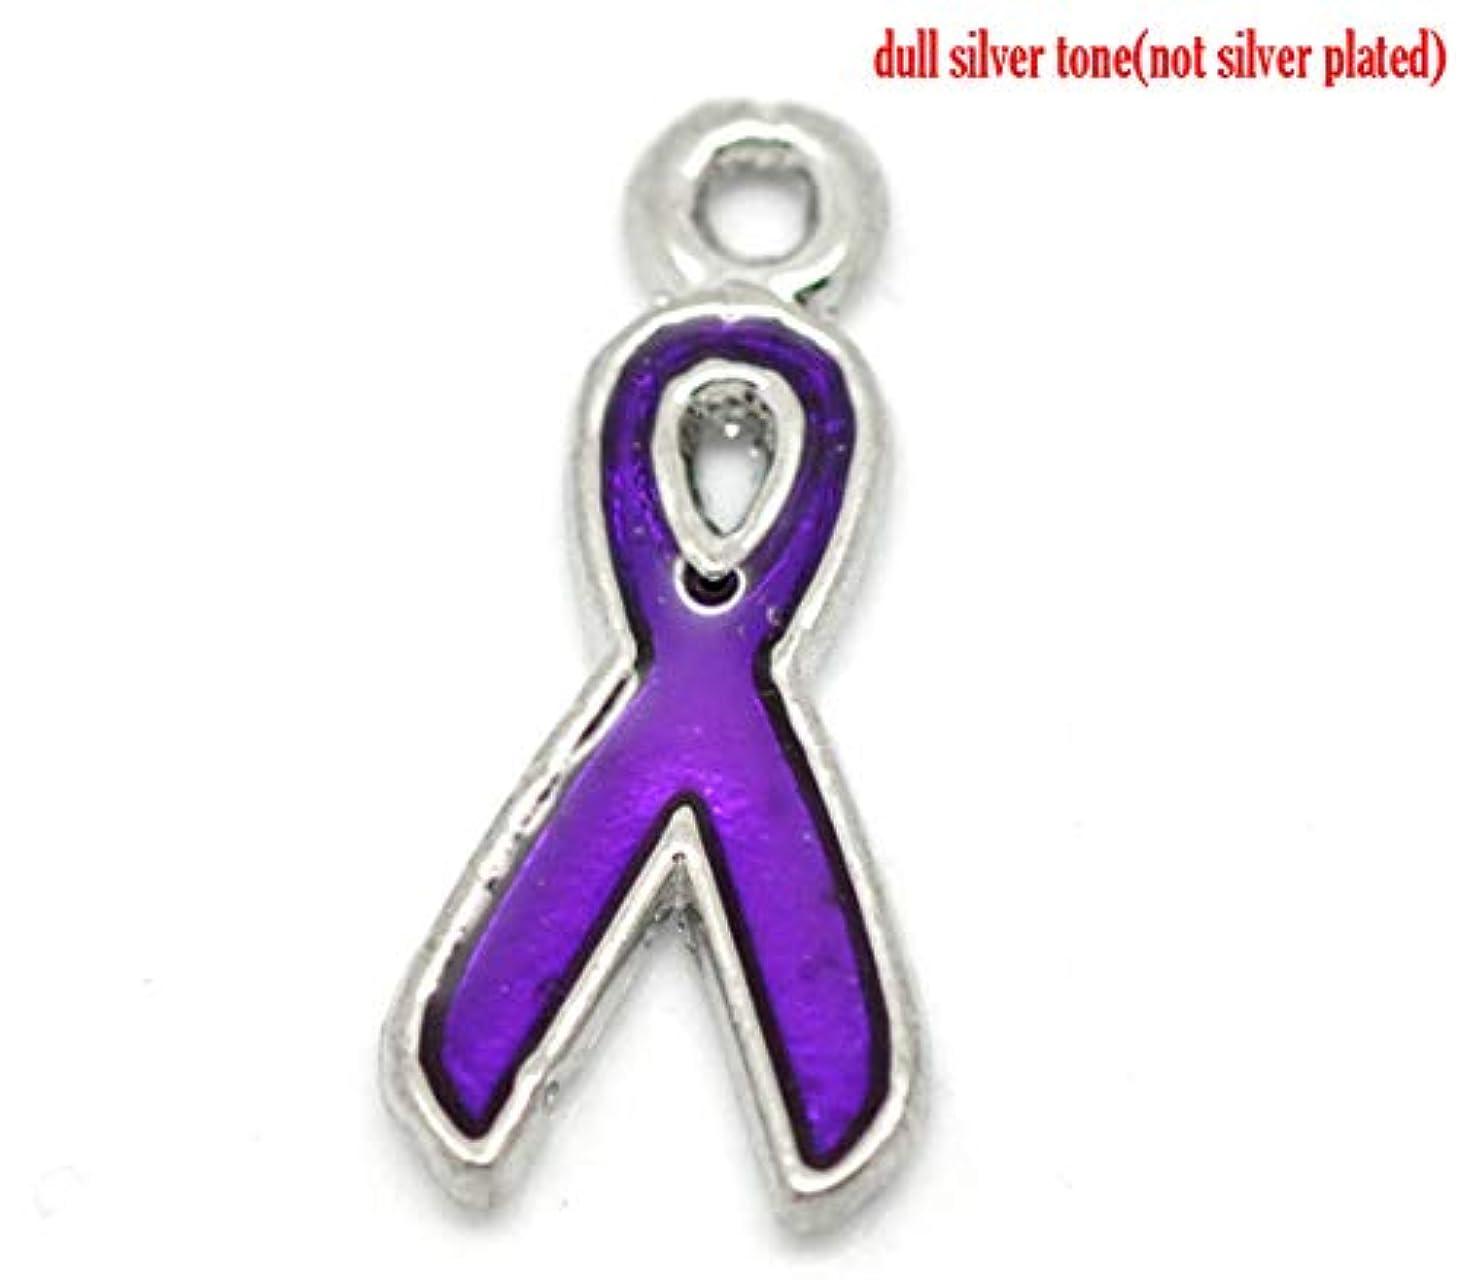 PEPPERLONELY 20pc Silver Tone Alloy Purple Enamel Ribbon Charms Pendants 20x9mm (3/4